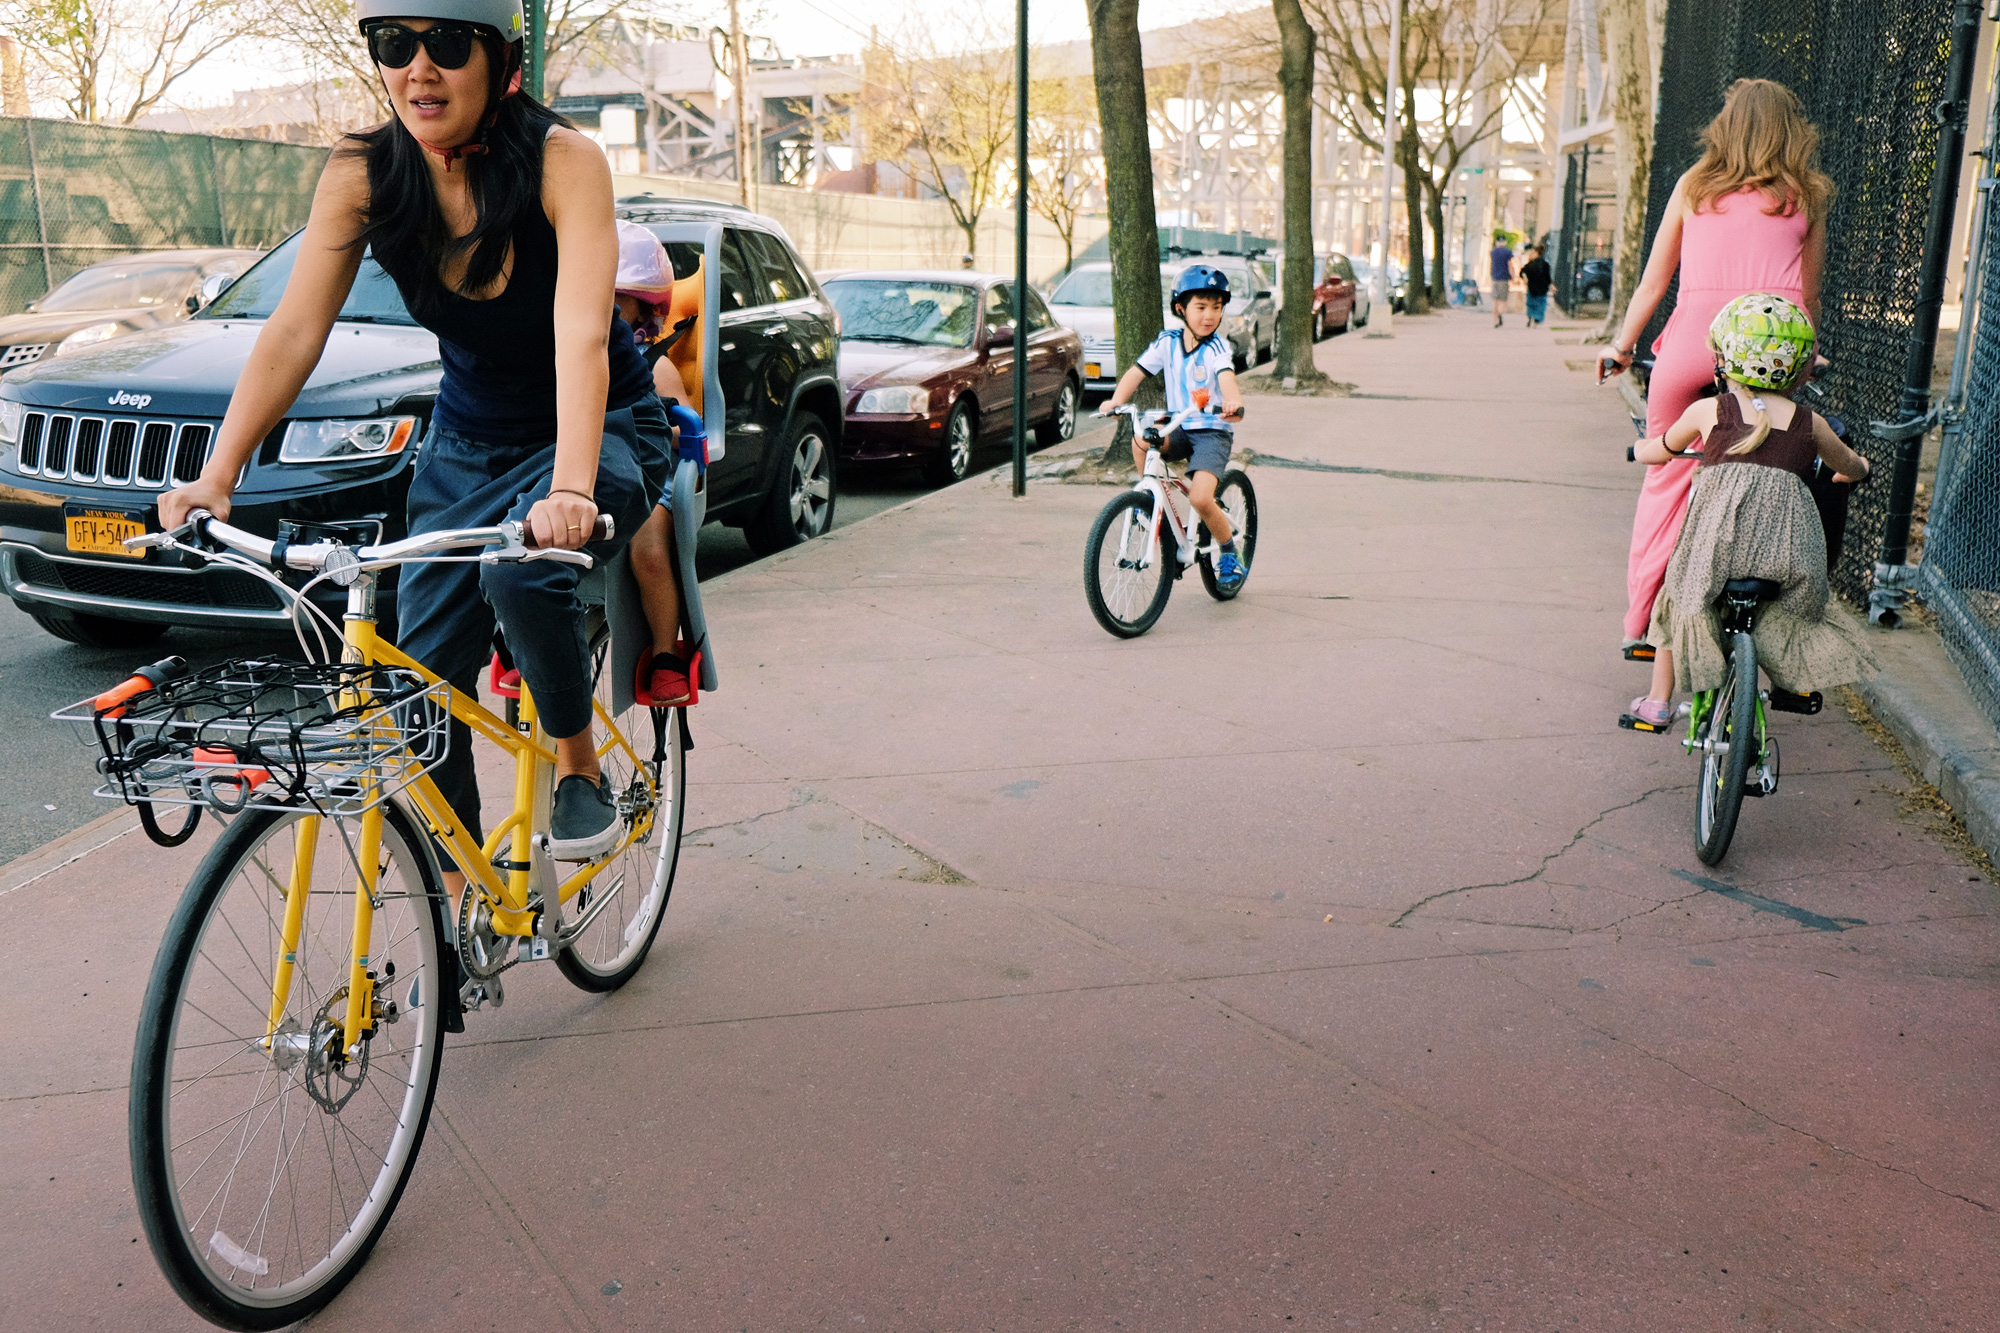 Bikabout_NYC_kids-biking.jpg